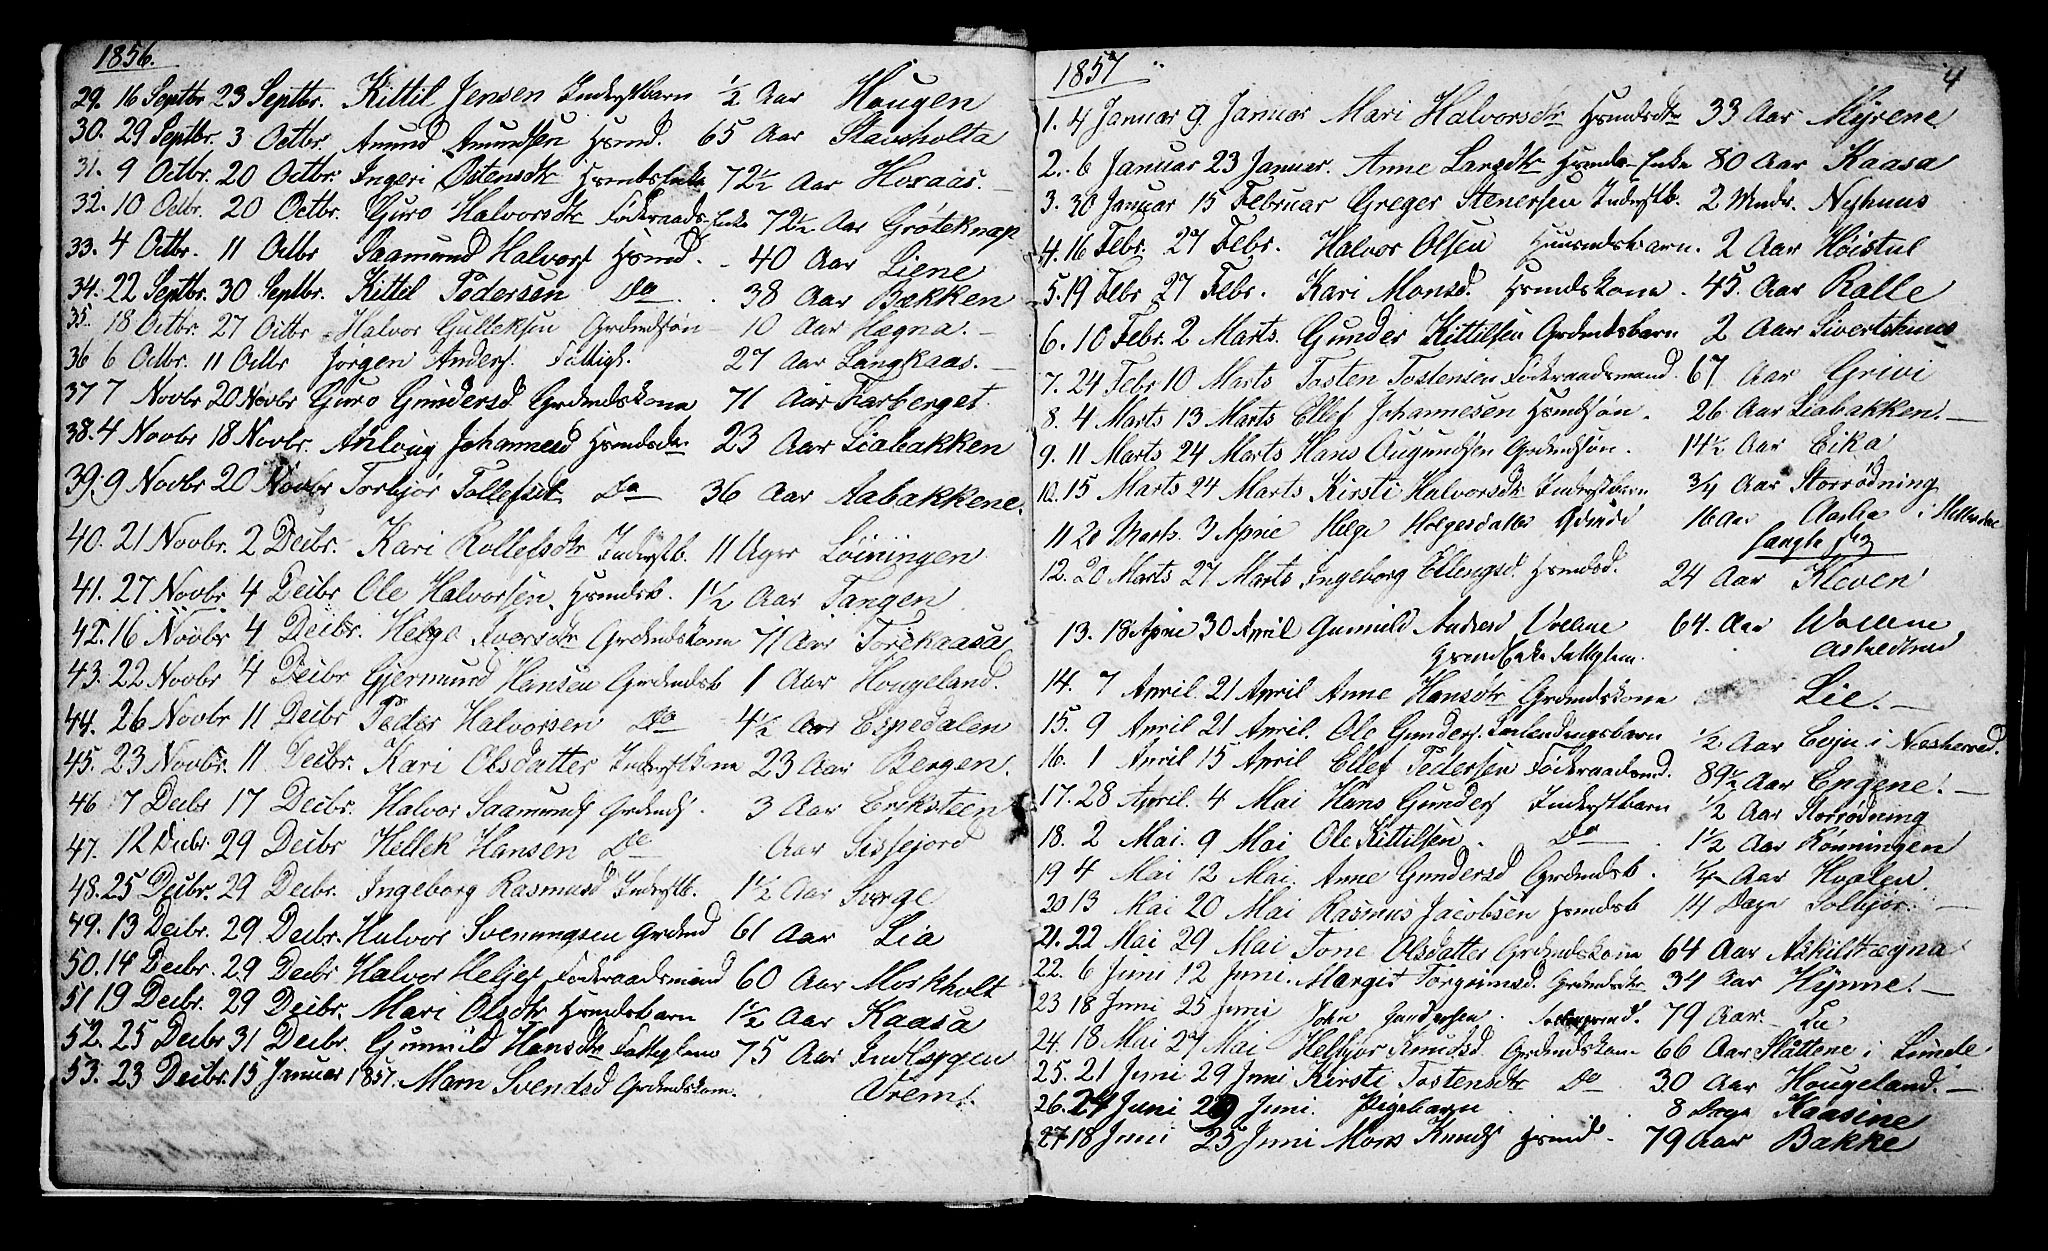 SAKO, Bø kirkebøker, G/Ga/L0002: Klokkerbok nr. 2, 1853-1866, s. 4